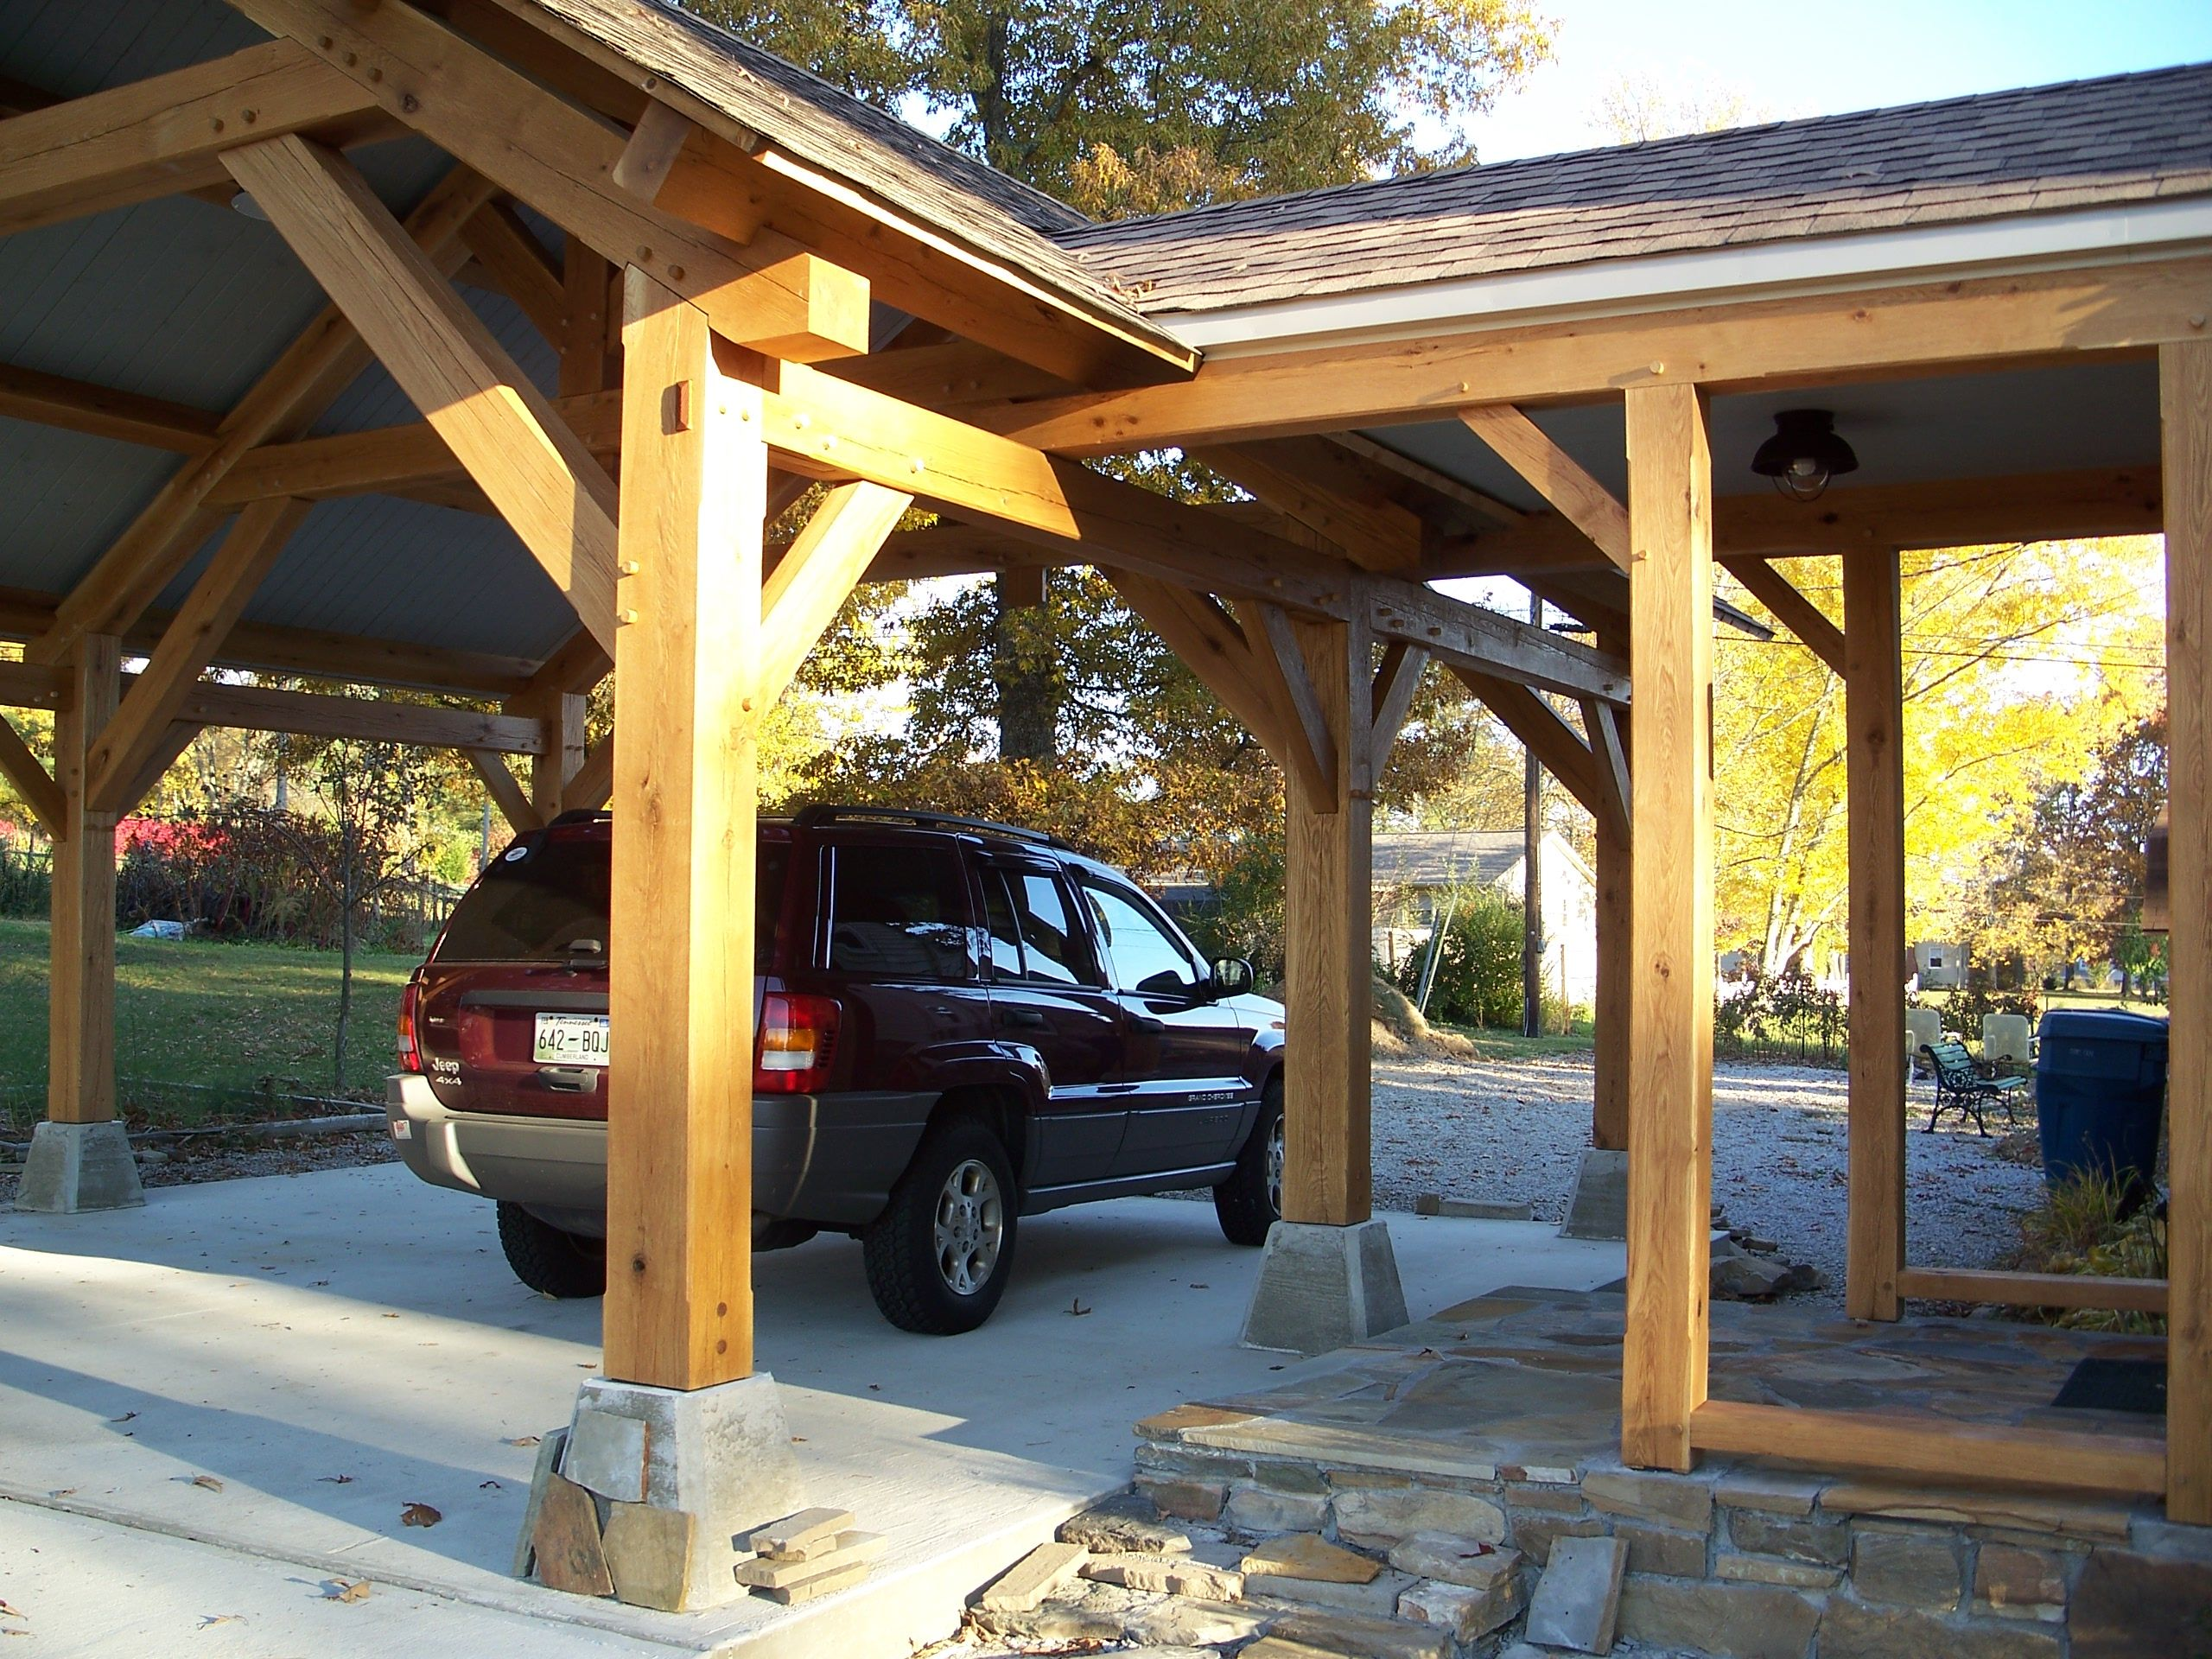 Outdoor Living - Timber Frame Pavilion - Timber Frame Porte-Cochere ...